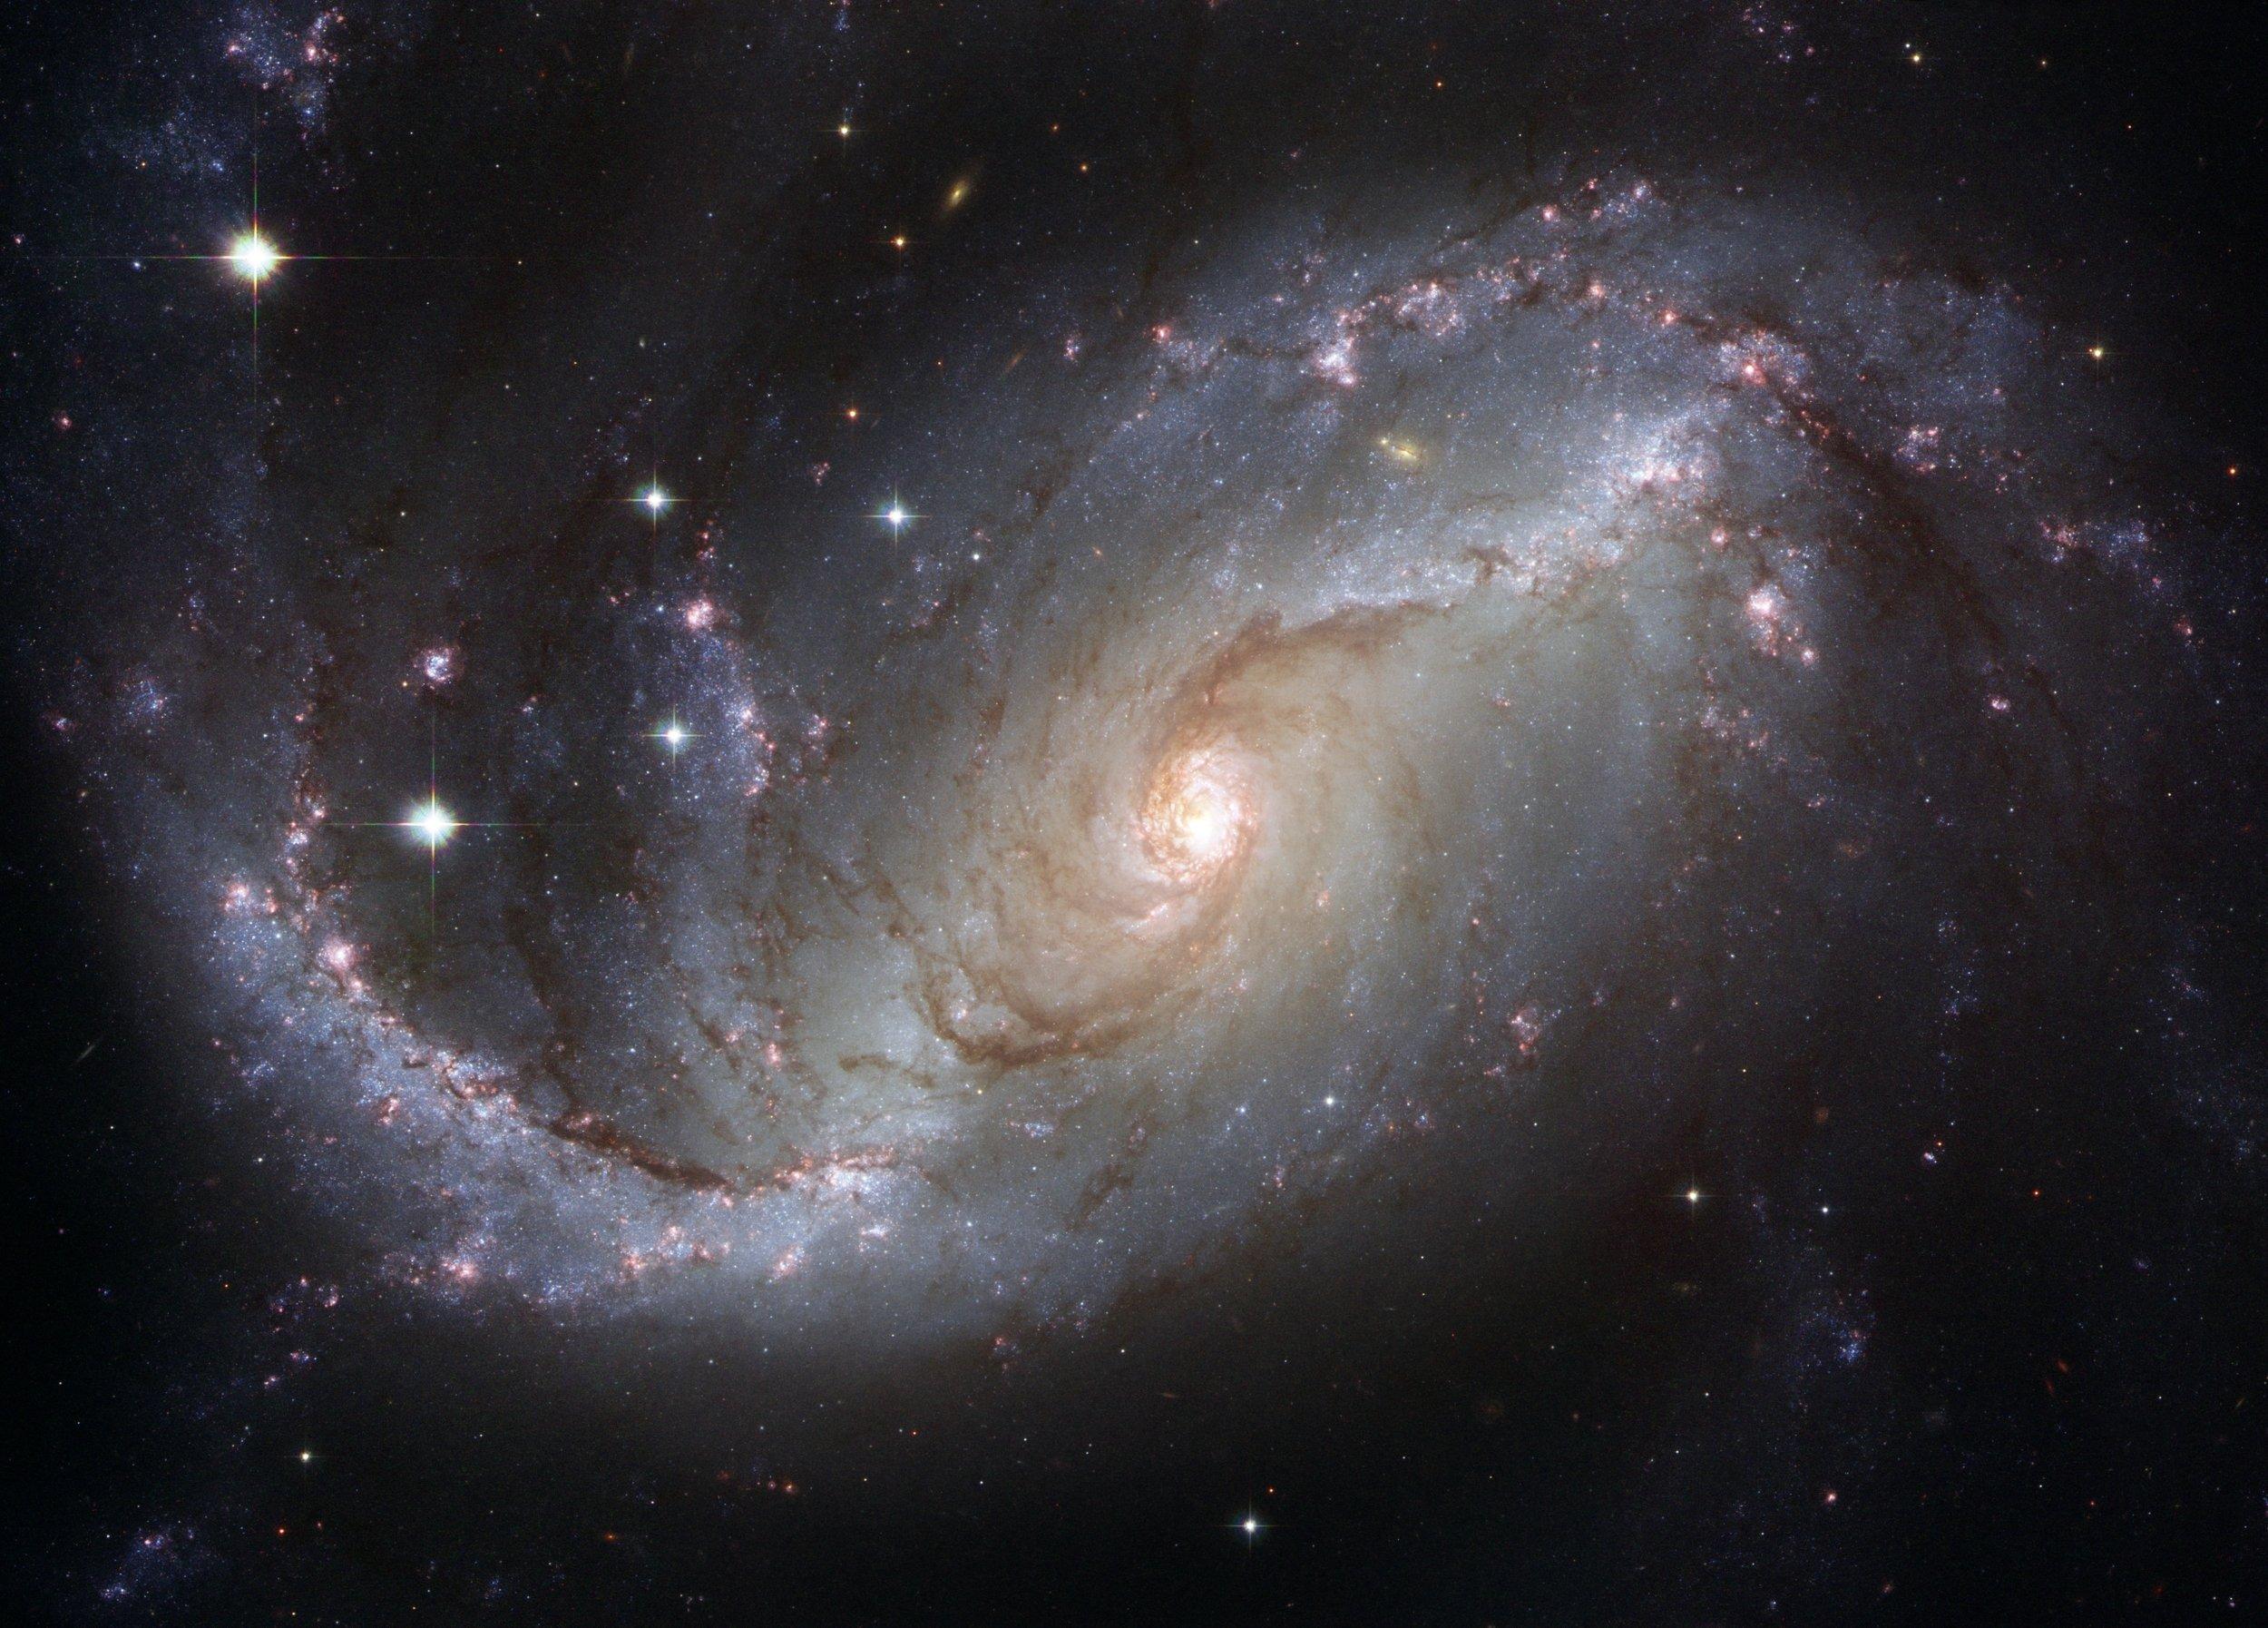 Space Galaxy Wallpaper Hd 5